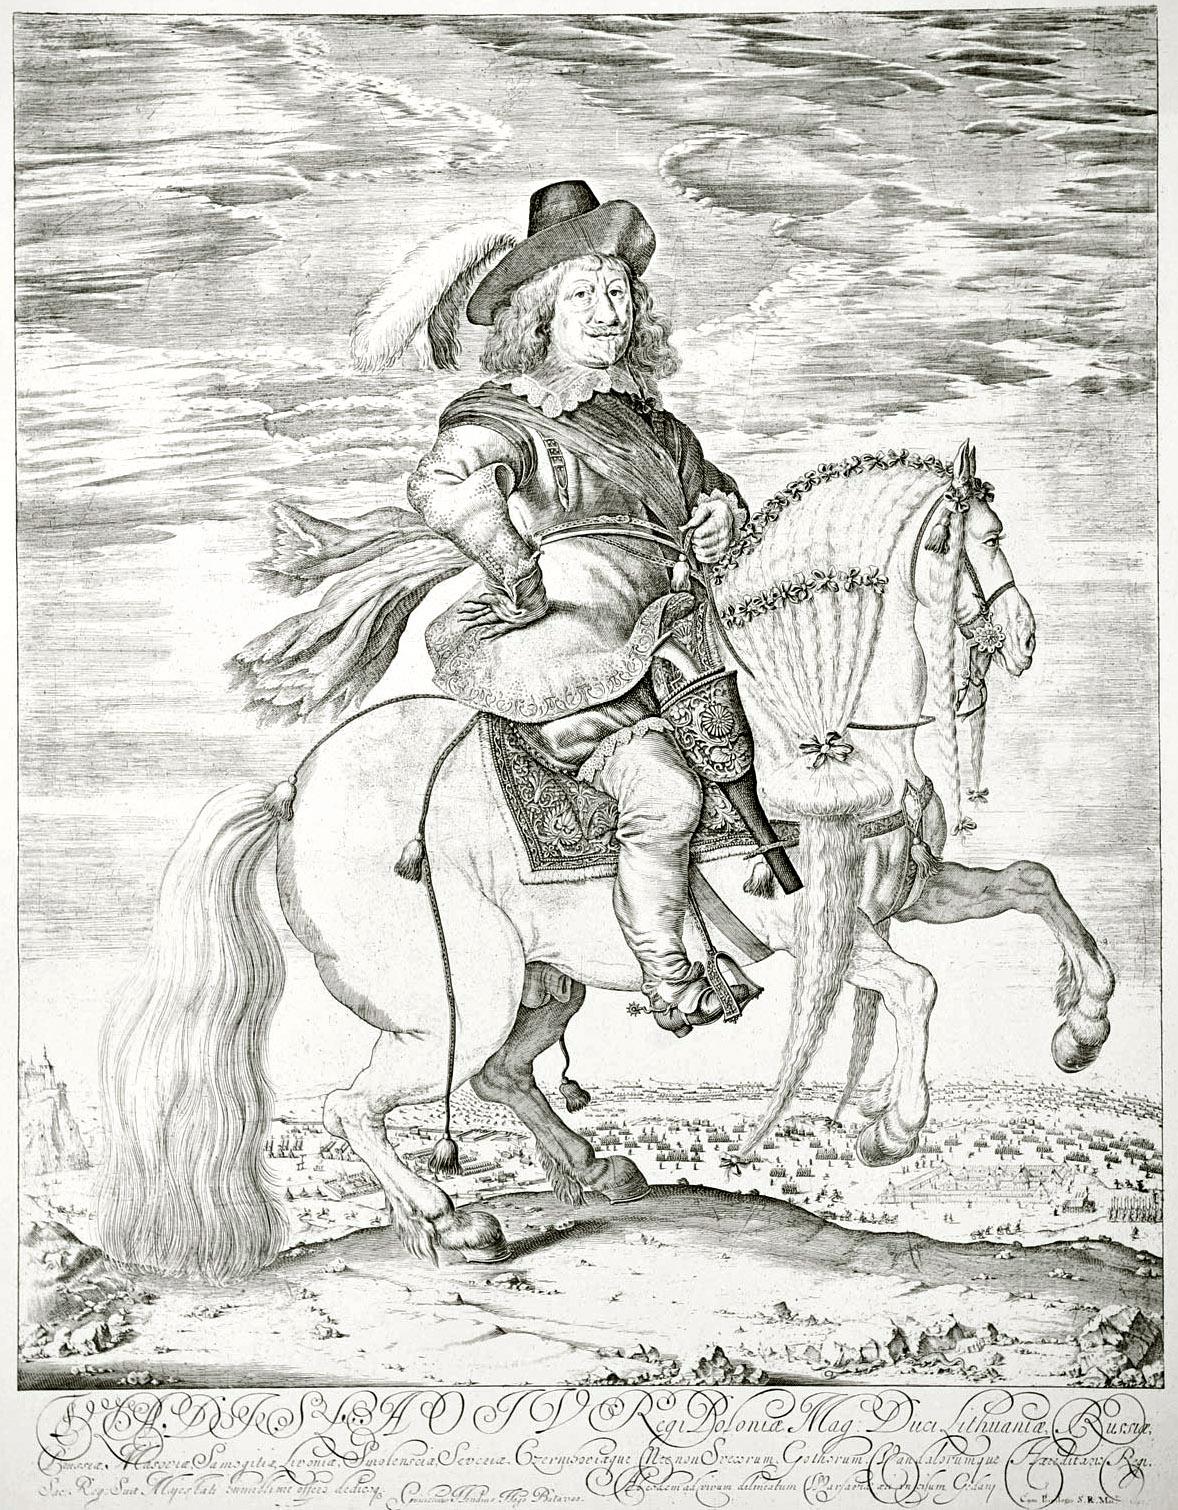 30. ������ ������� ������ ����������, ������������� � 1648 ���� ����������� ���������